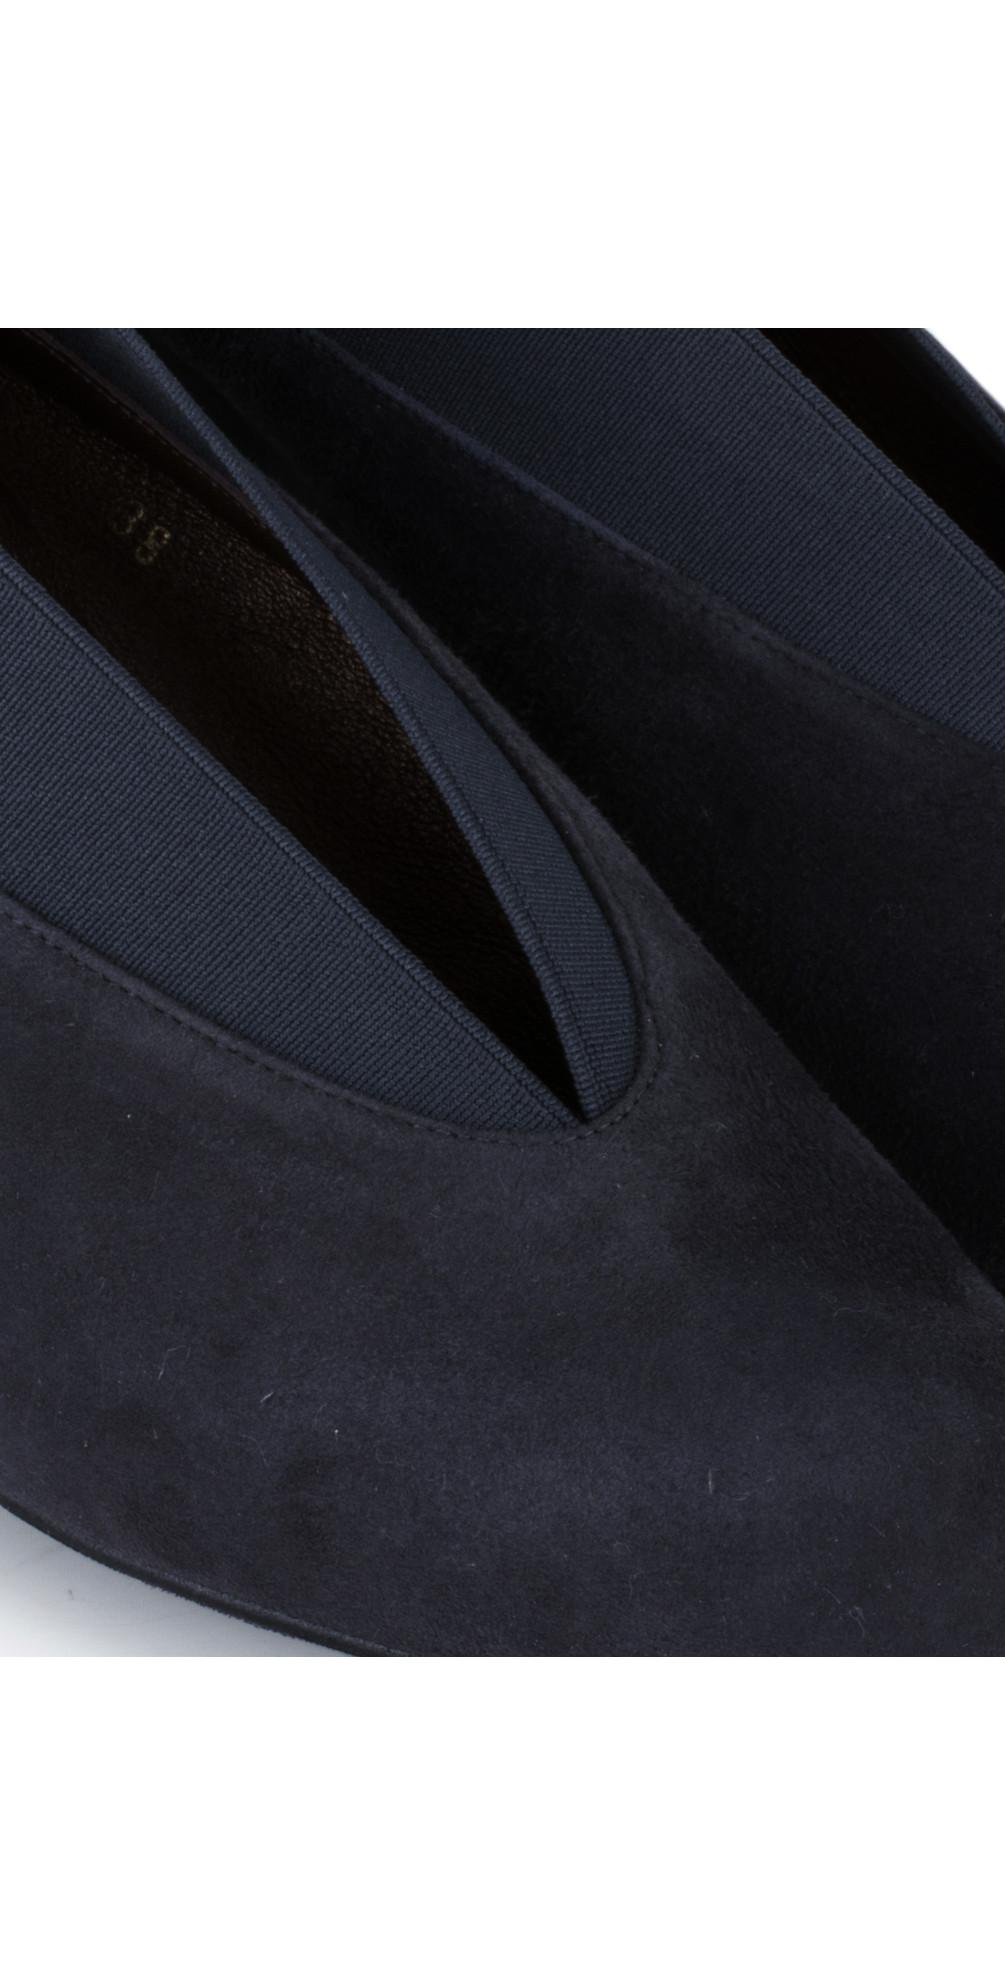 Brumabe Navy Suede Shoe main image